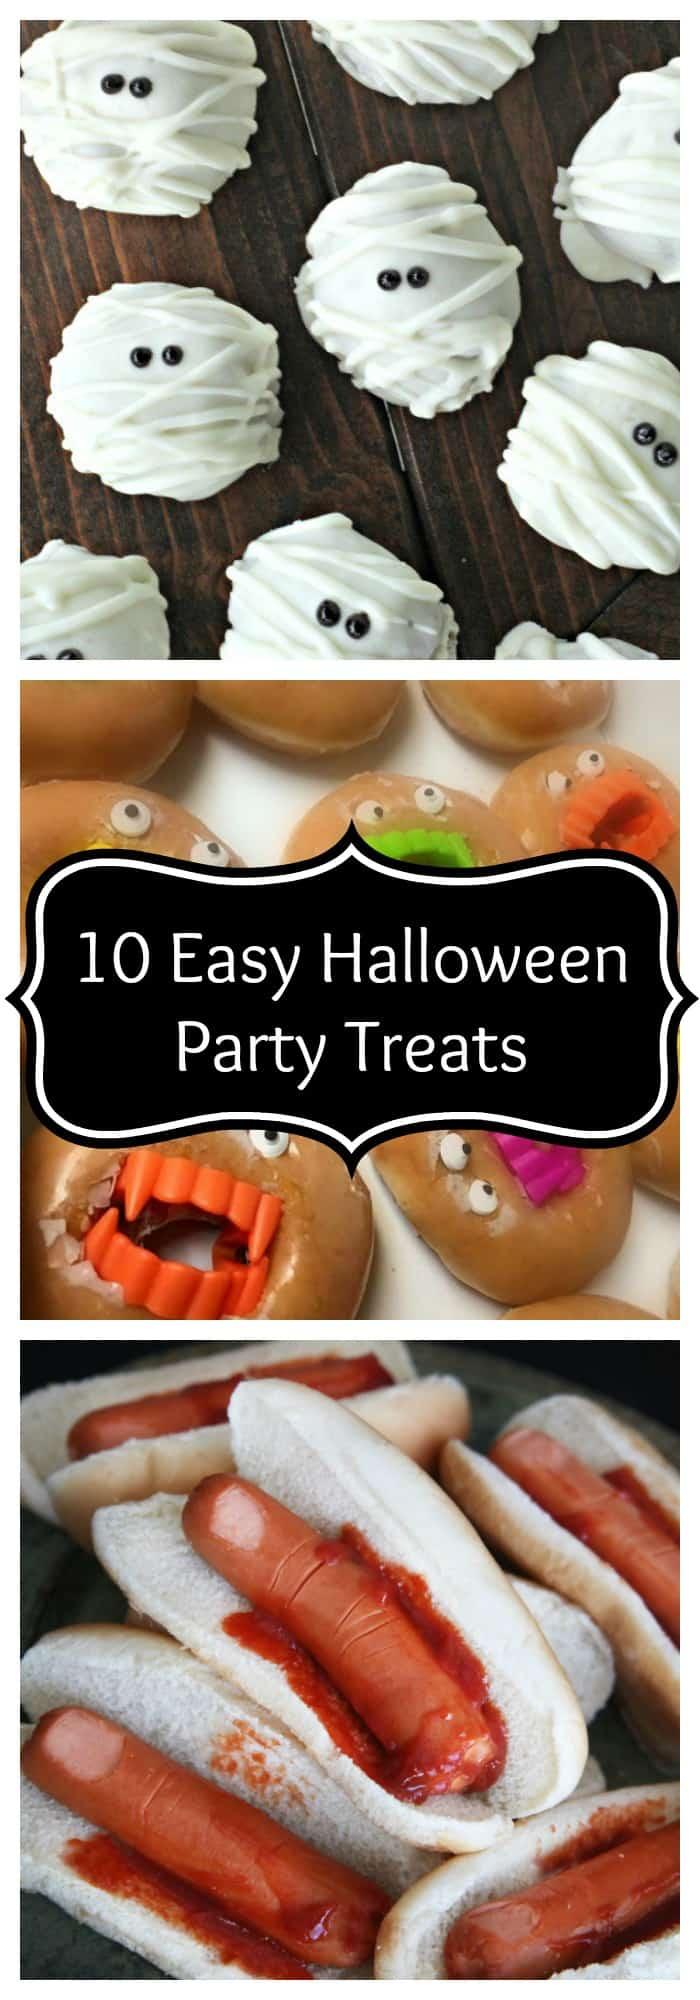 Halloween-10 Easy Halloween Party Treats- The Organized Mom